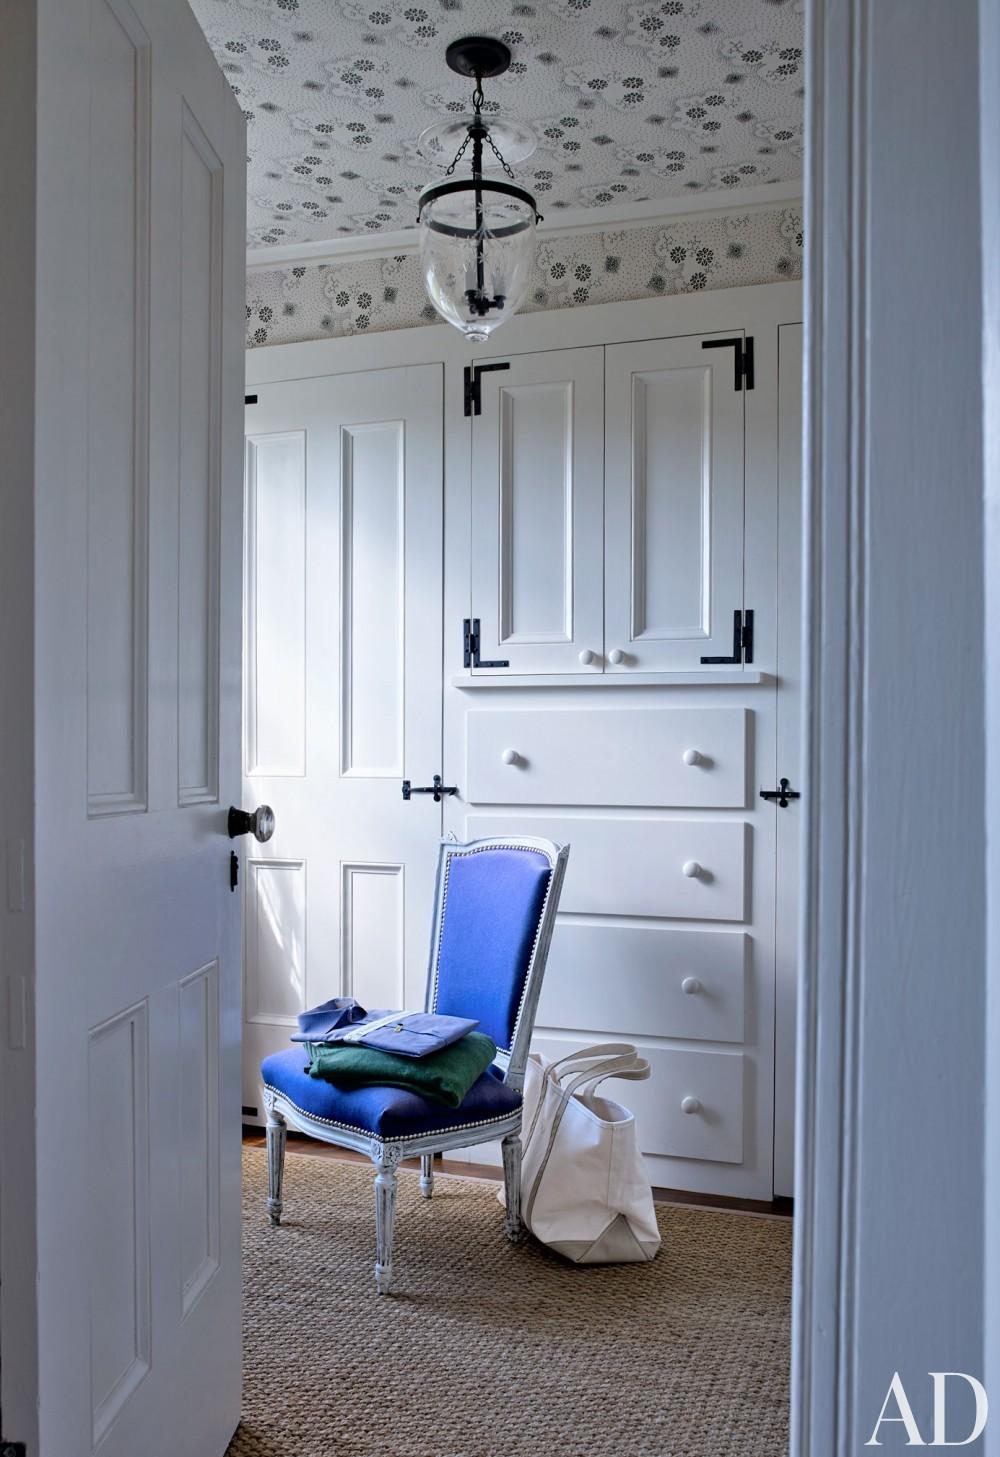 Traditional Dressing Room/Closet by Harry Heissmann and Jonathon Parisen in Hudson Valley, NY